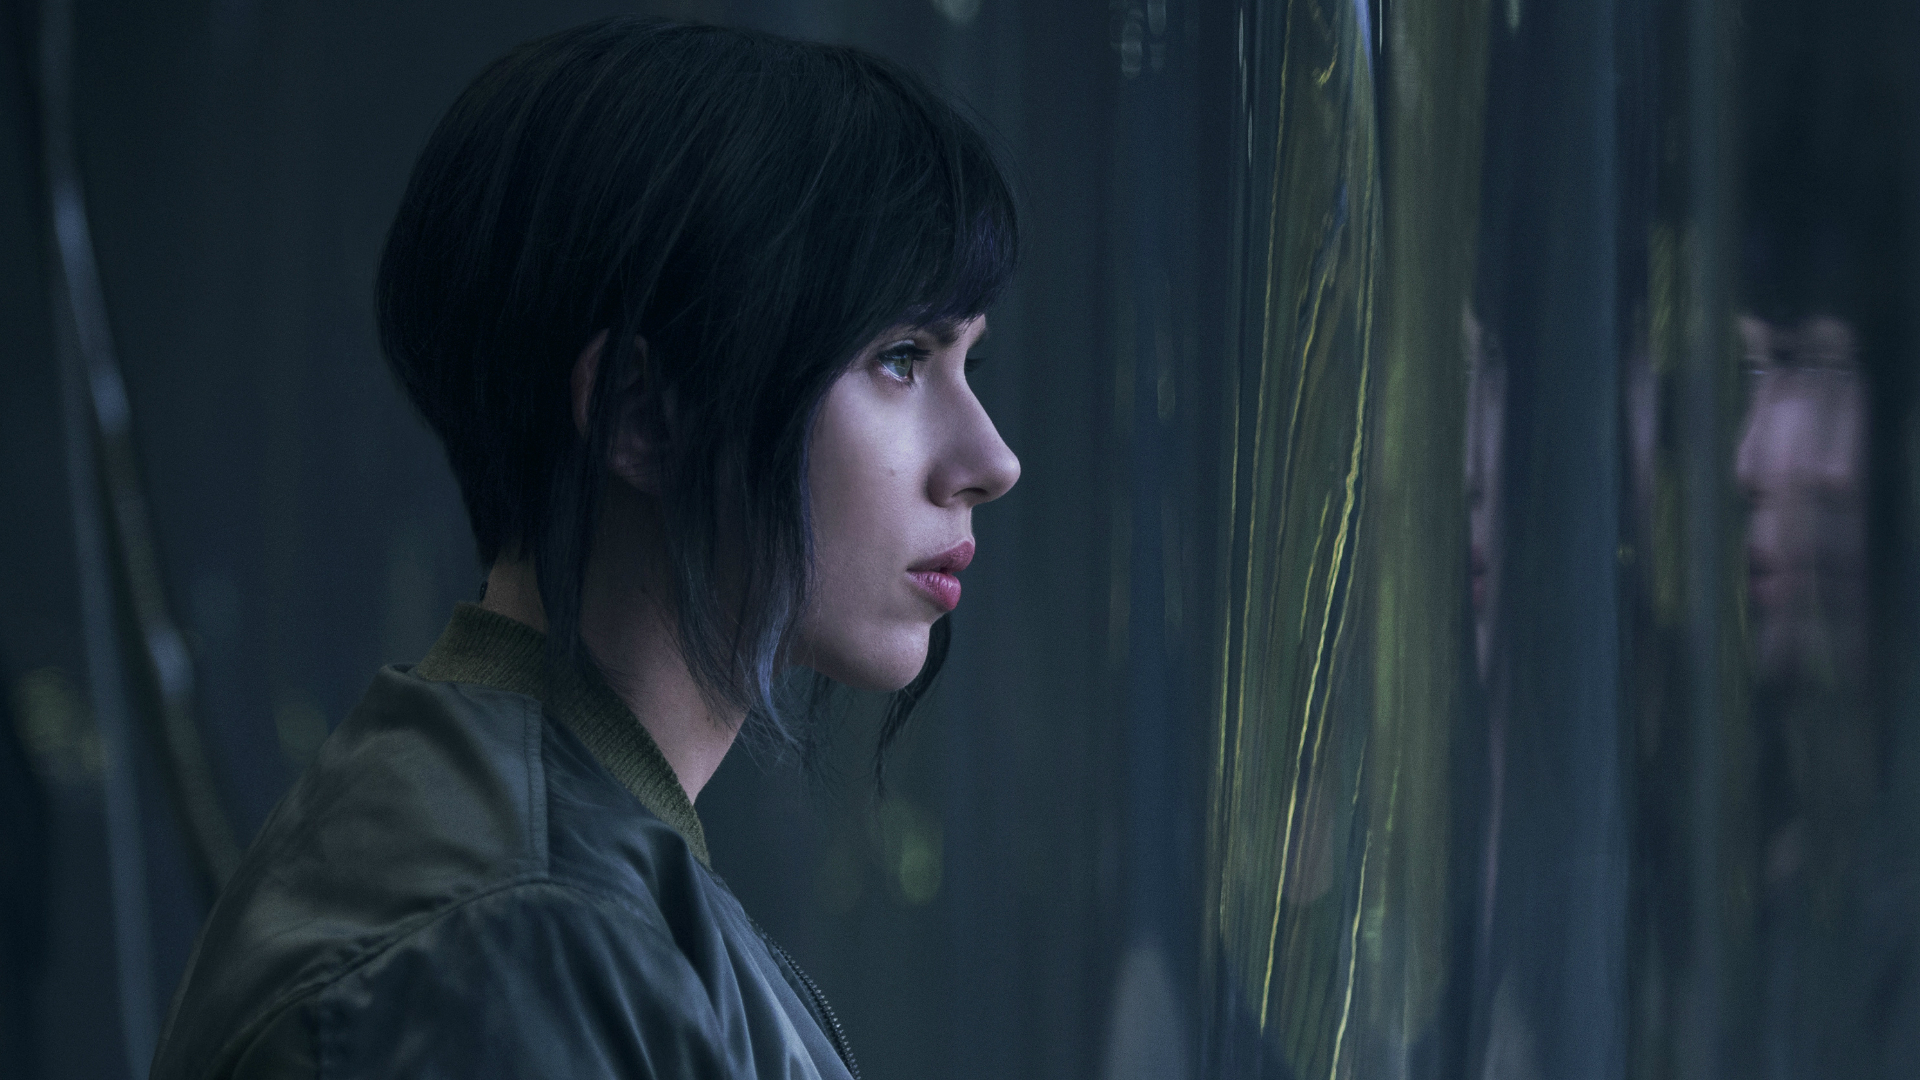 Ghost in the Shell trailer: Scarlett Johansson transforms